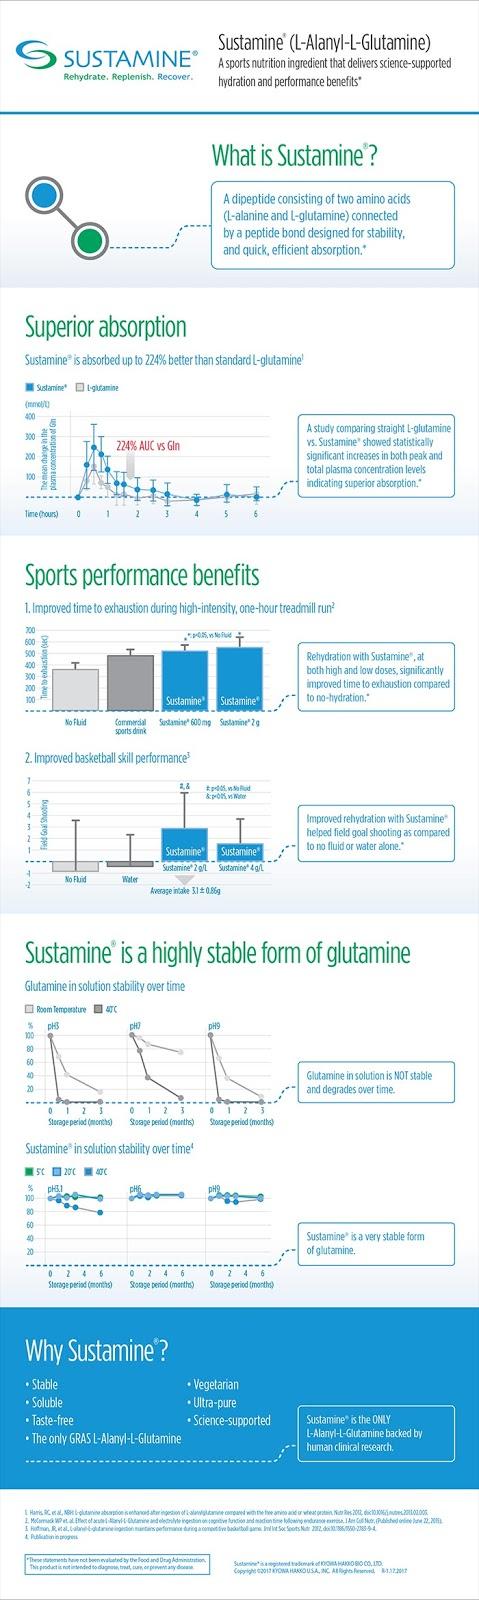 sustamine-infographic.jpg